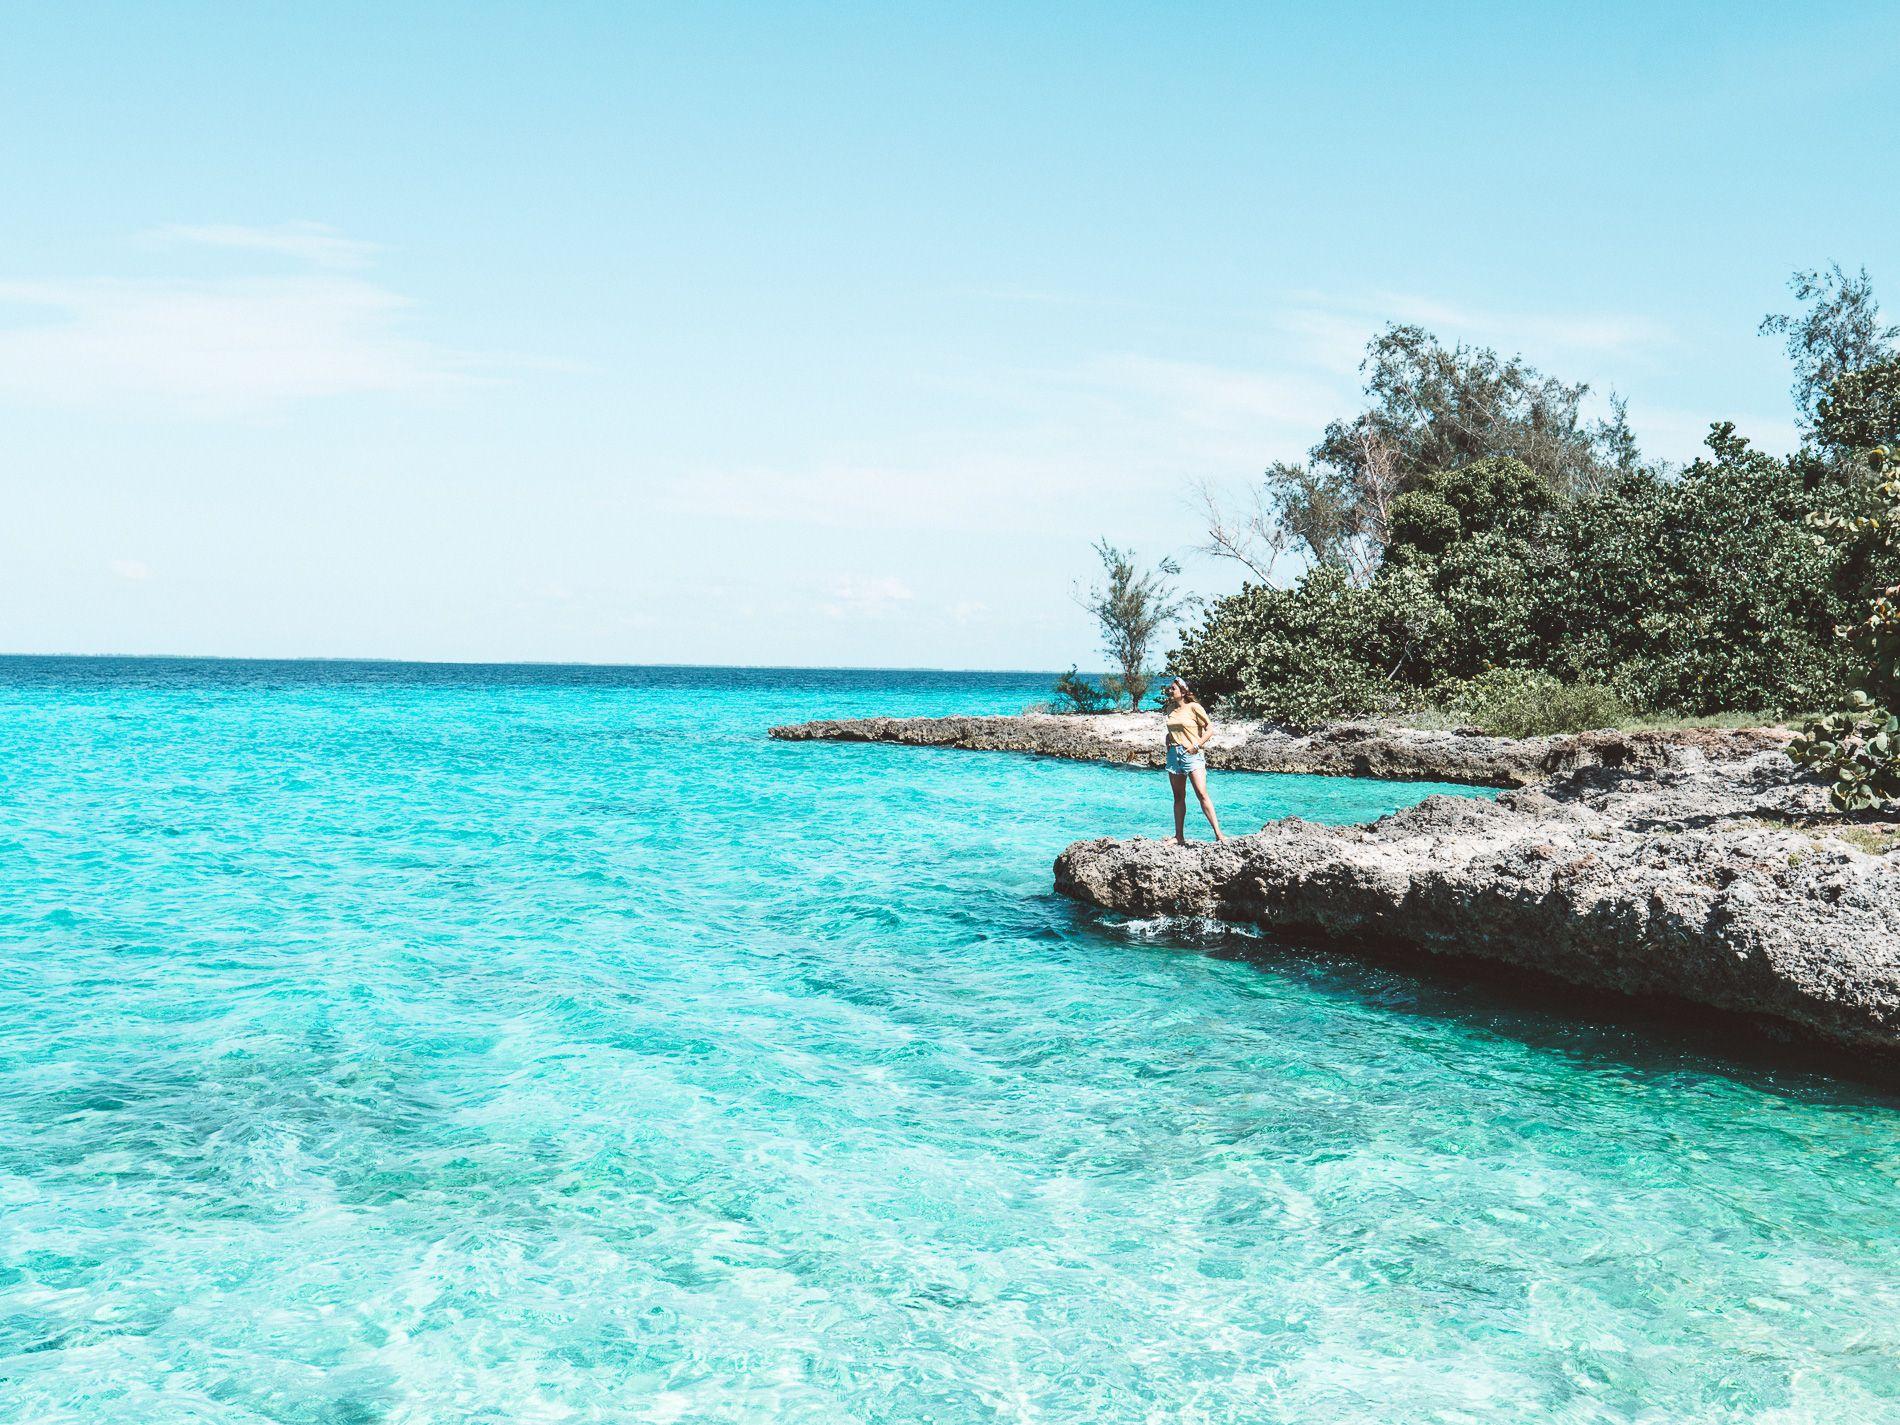 Cuba | carte | cienaga de zapata | playa larga | playa giron